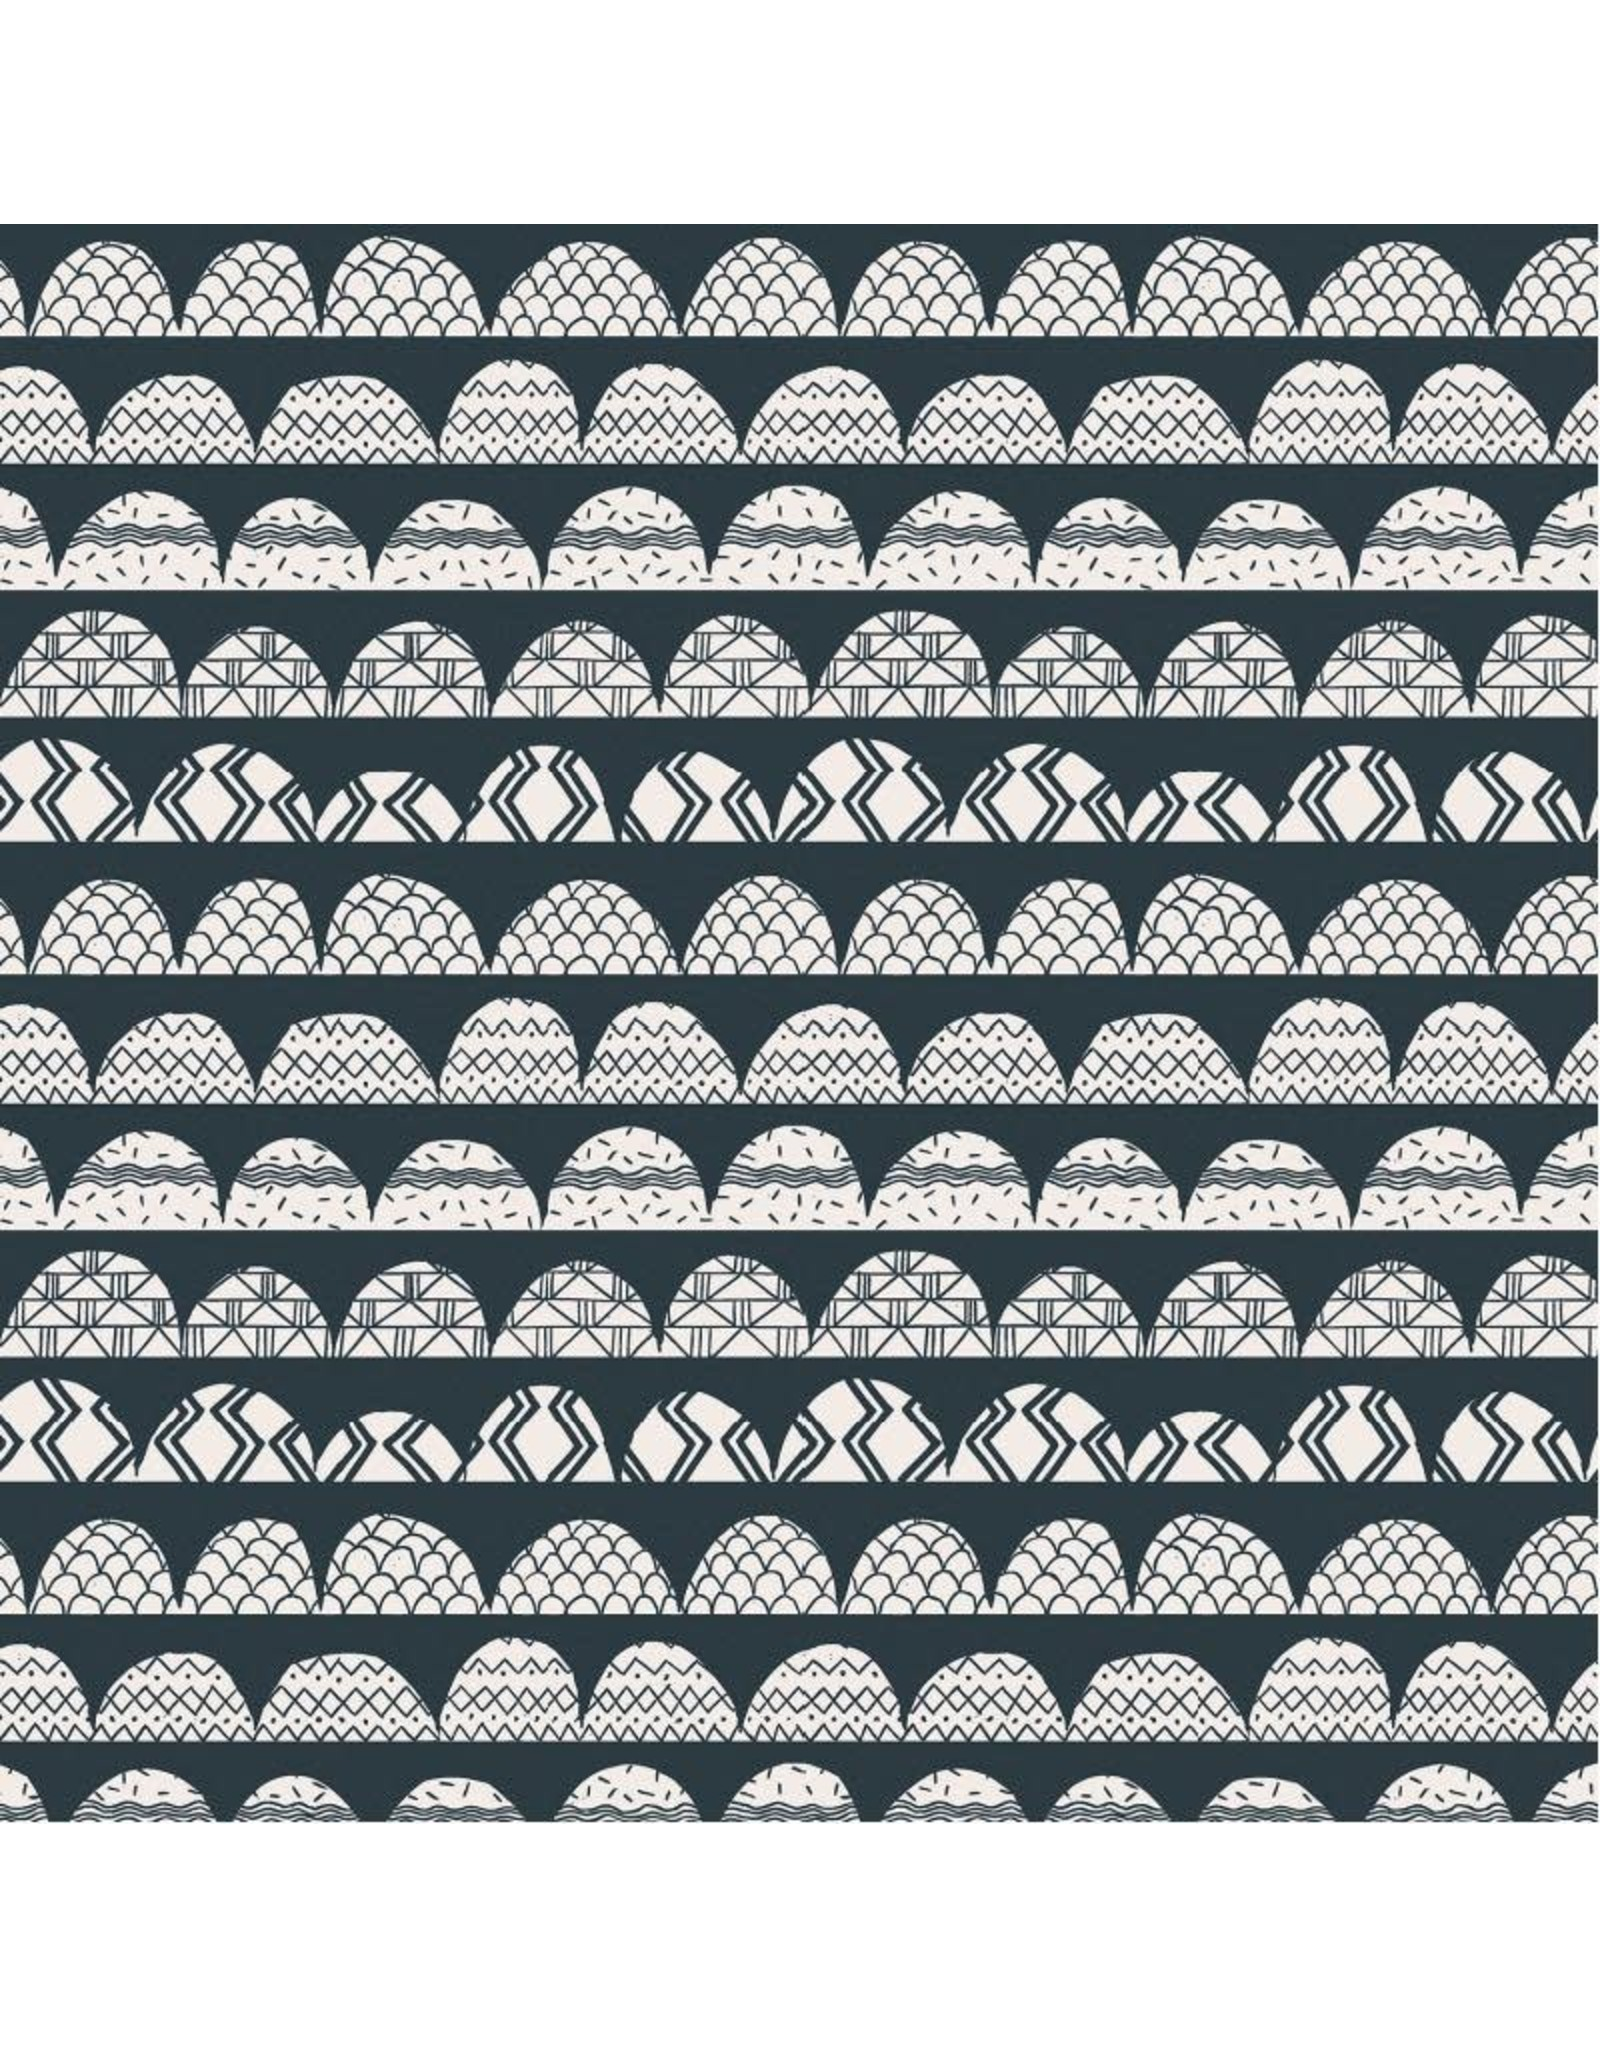 Cotton + Steel All Through the Land, Hills in Hidden Falls, Fabric Half-Yards AM101-HF3